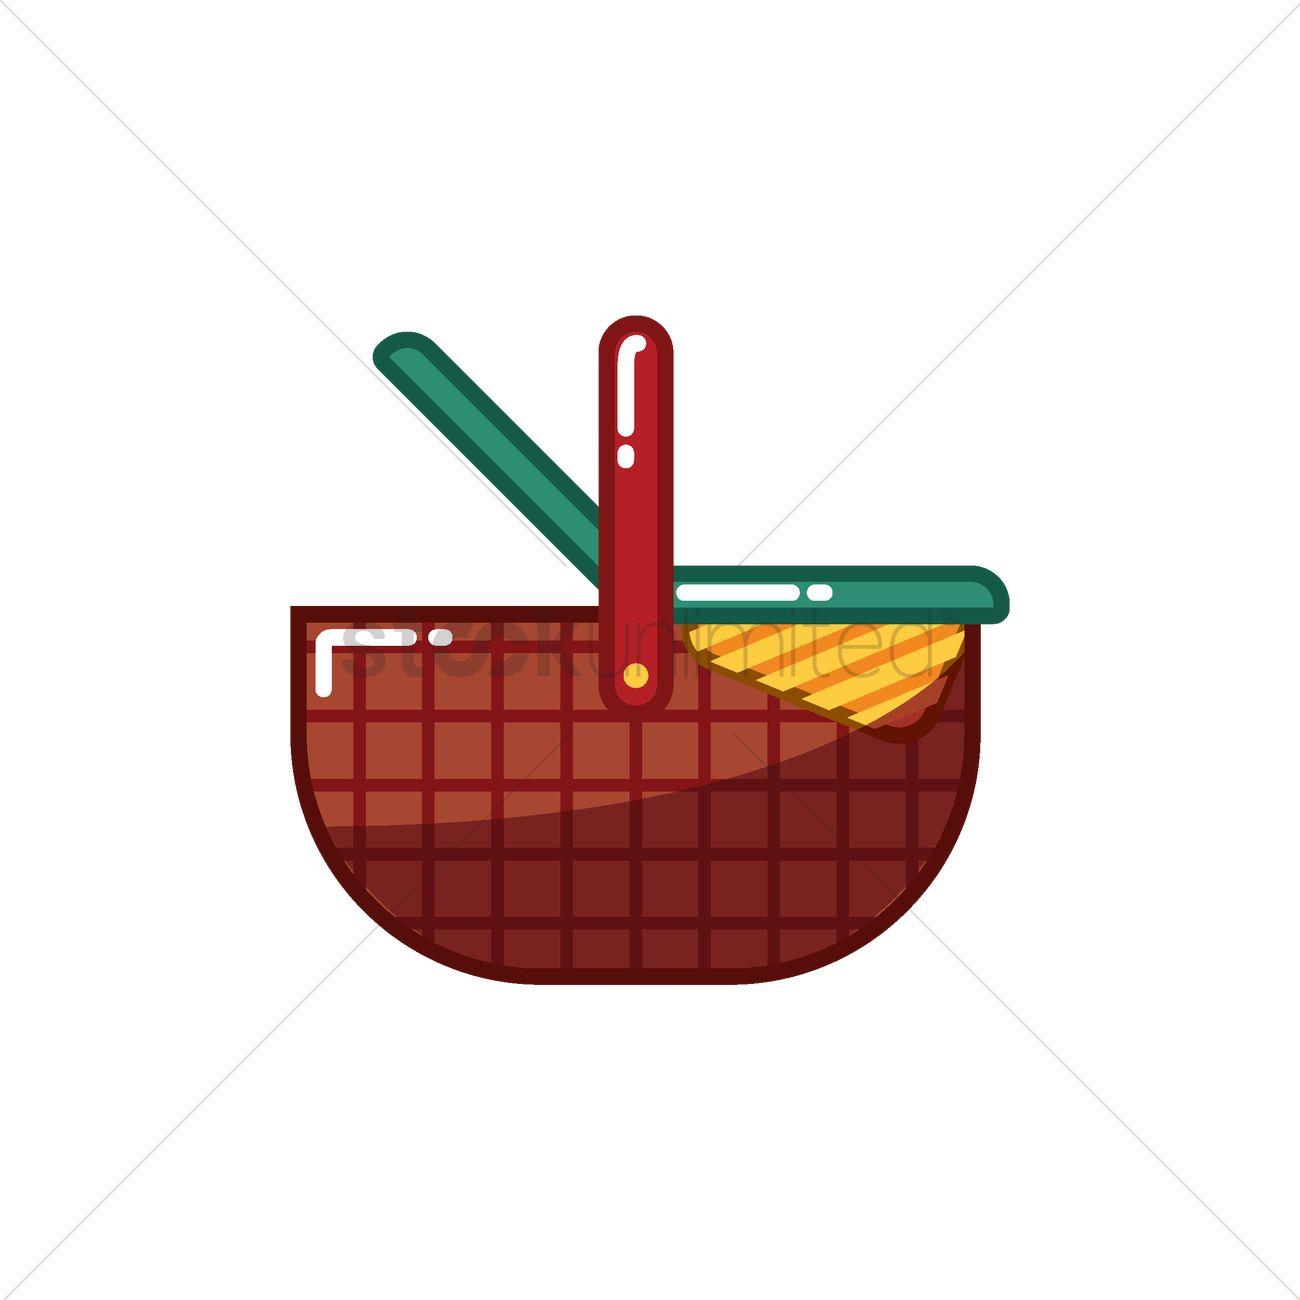 Picnic Basket Graphic : Picnic basket vector image stockunlimited